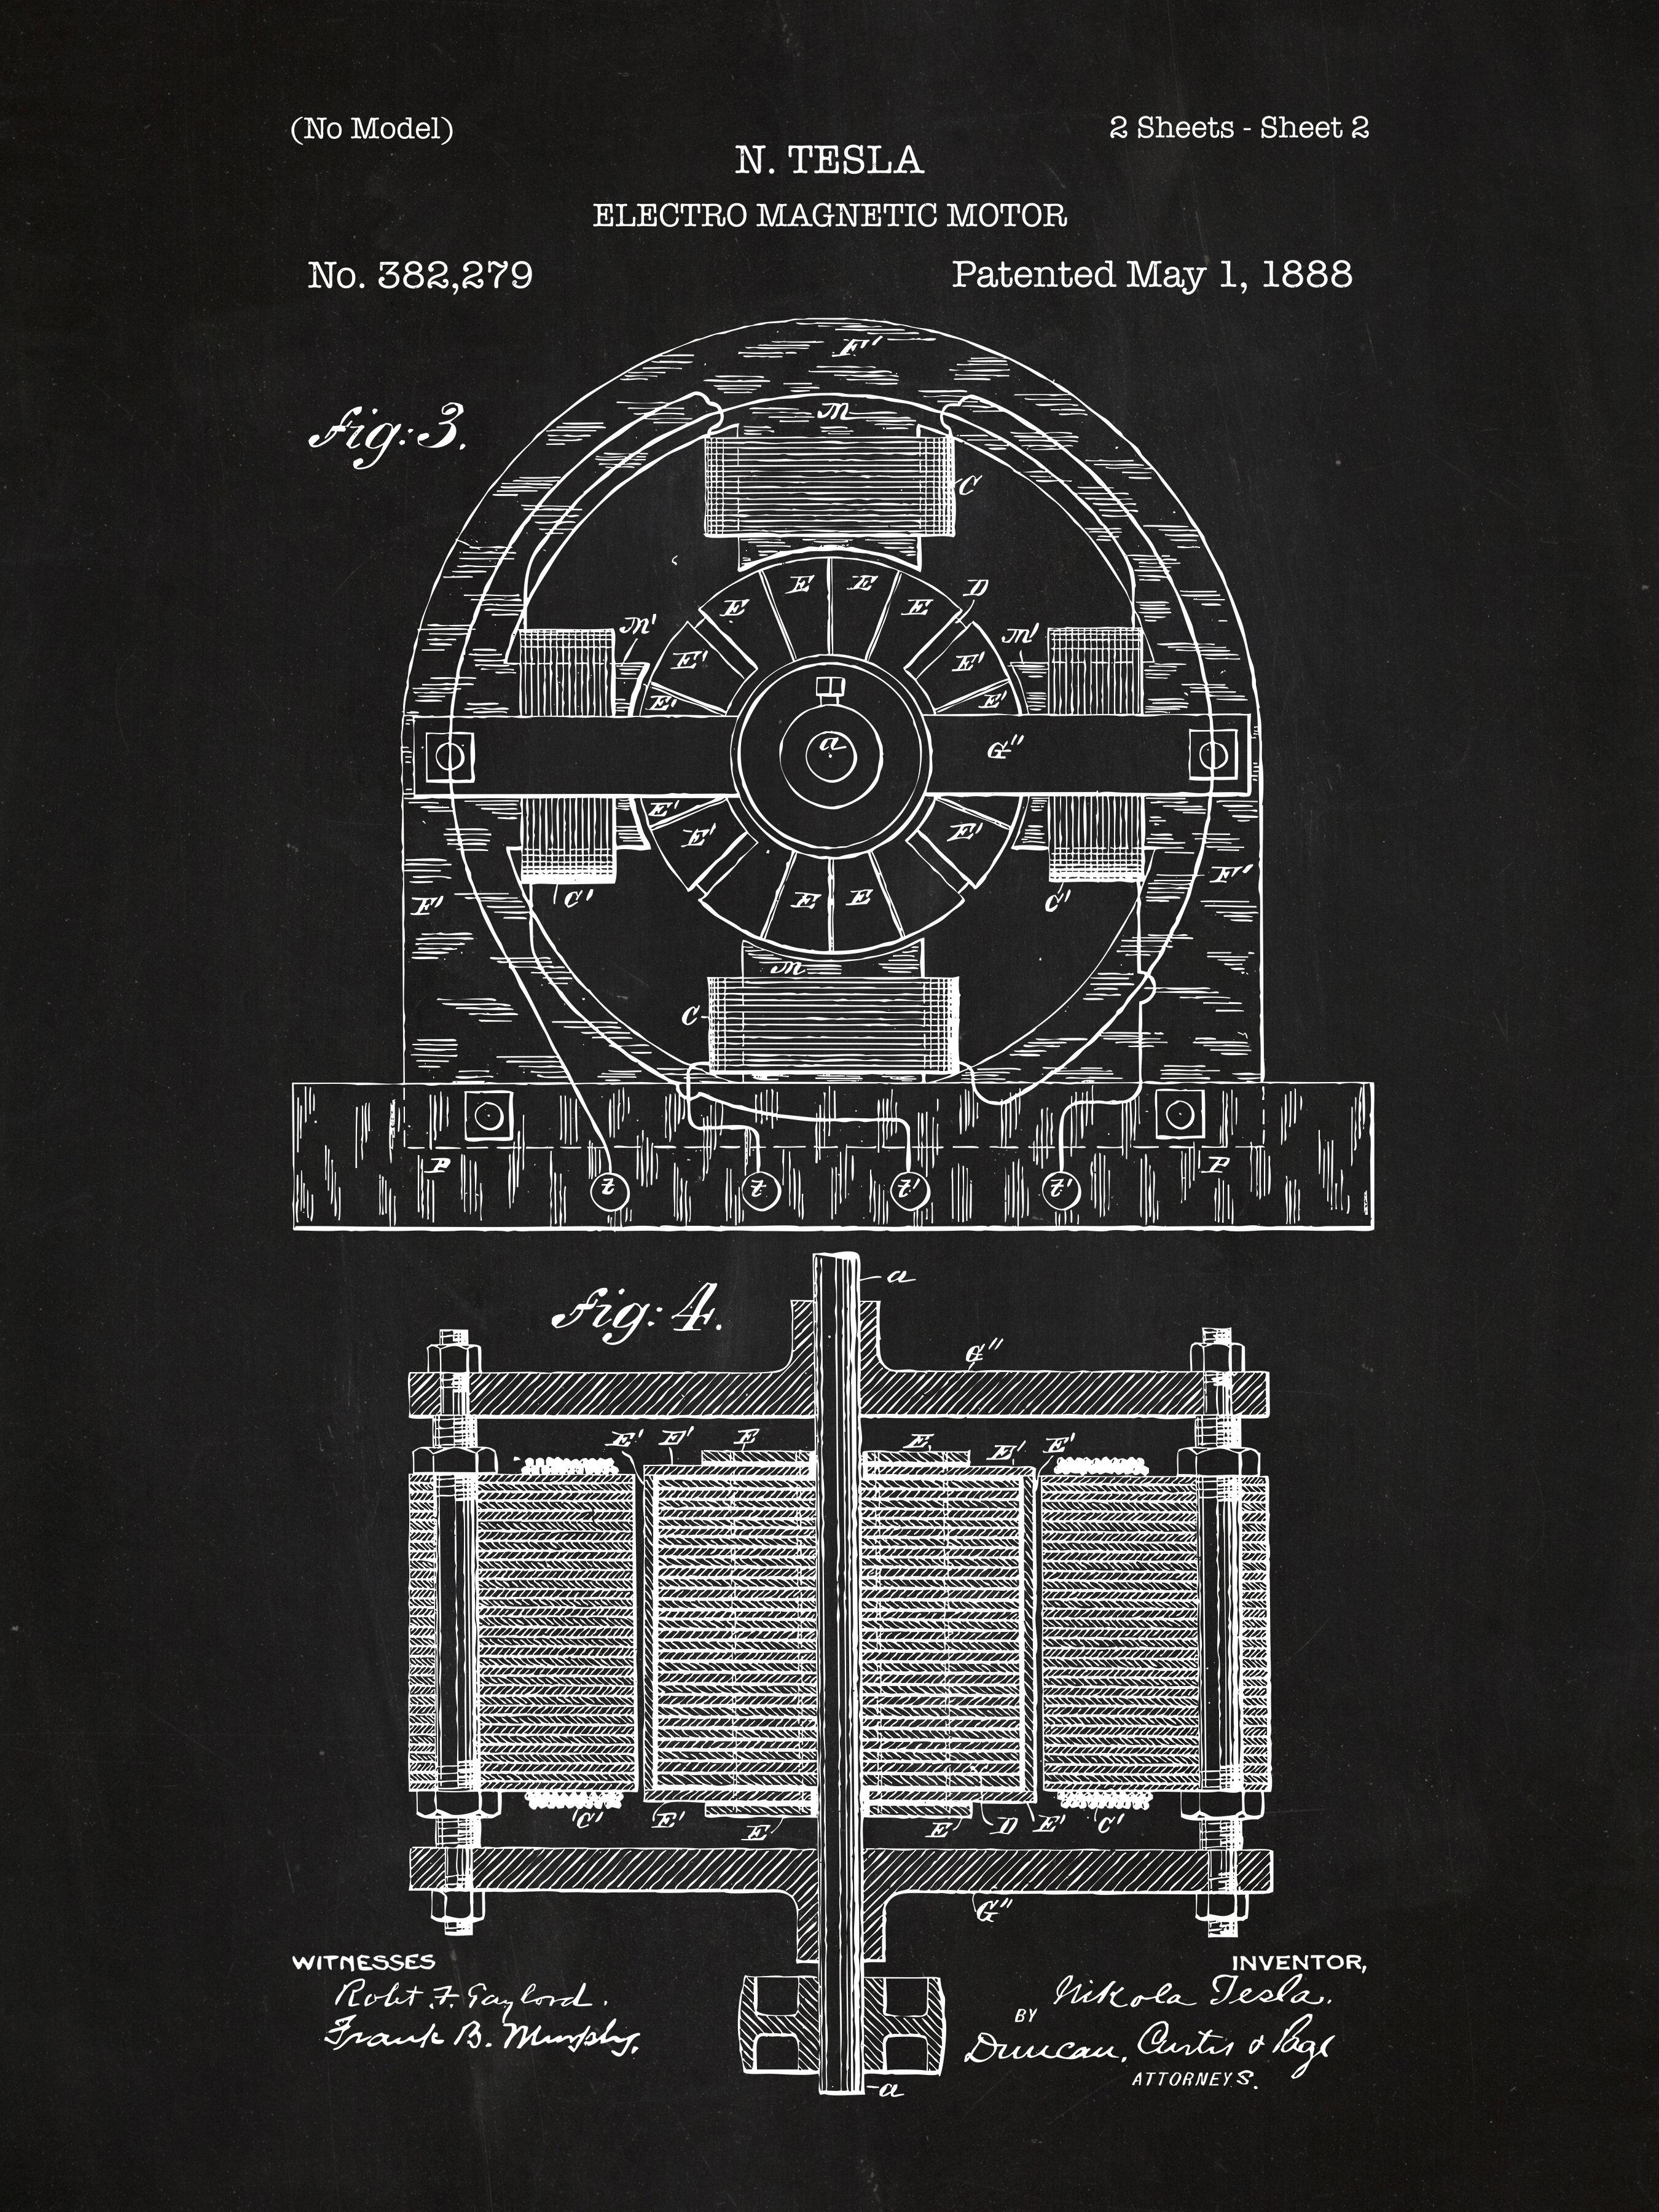 Inked and screened tesla electro magnetic motor blueprint graphic inked and screened tesla electro magnetic motor blueprint graphic art wayfair malvernweather Images